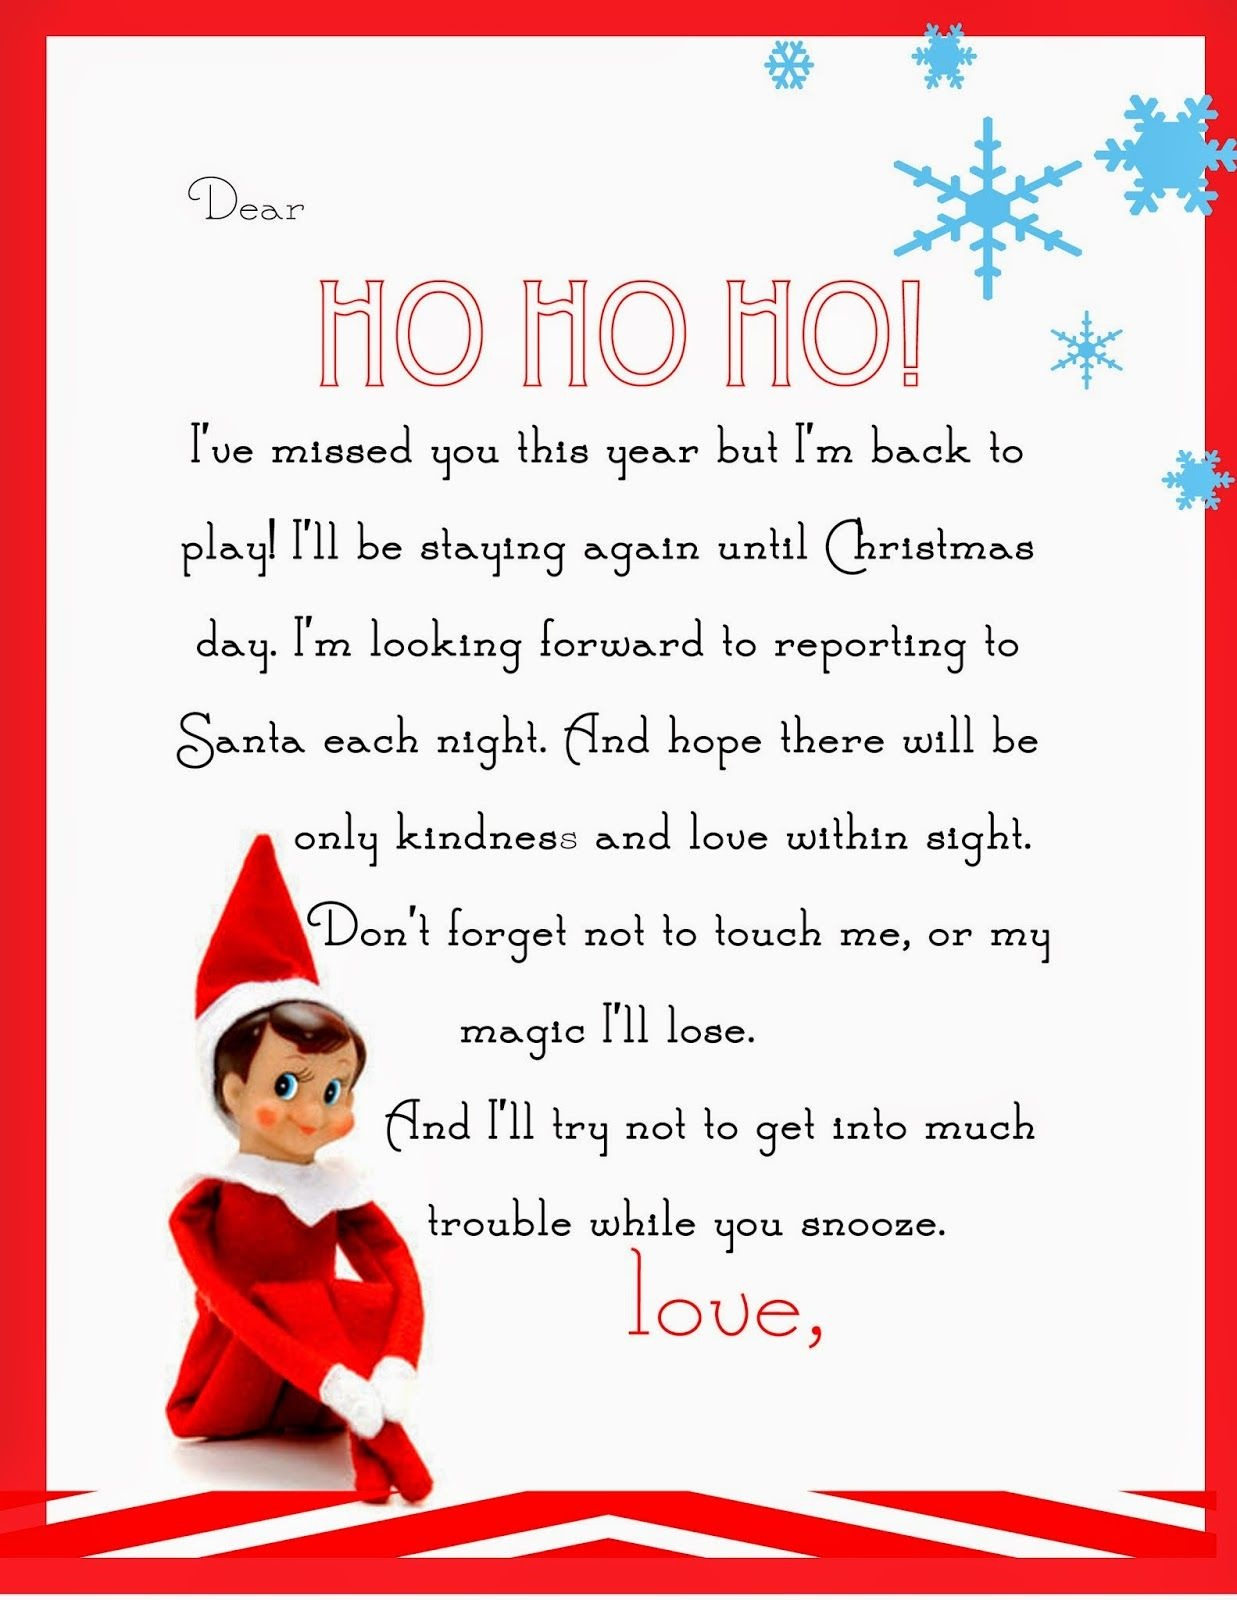 Elf On The Shelf Letter {Free Printable} | Christmas | Elf On The - Free Printable Elf On The Shelf Letter